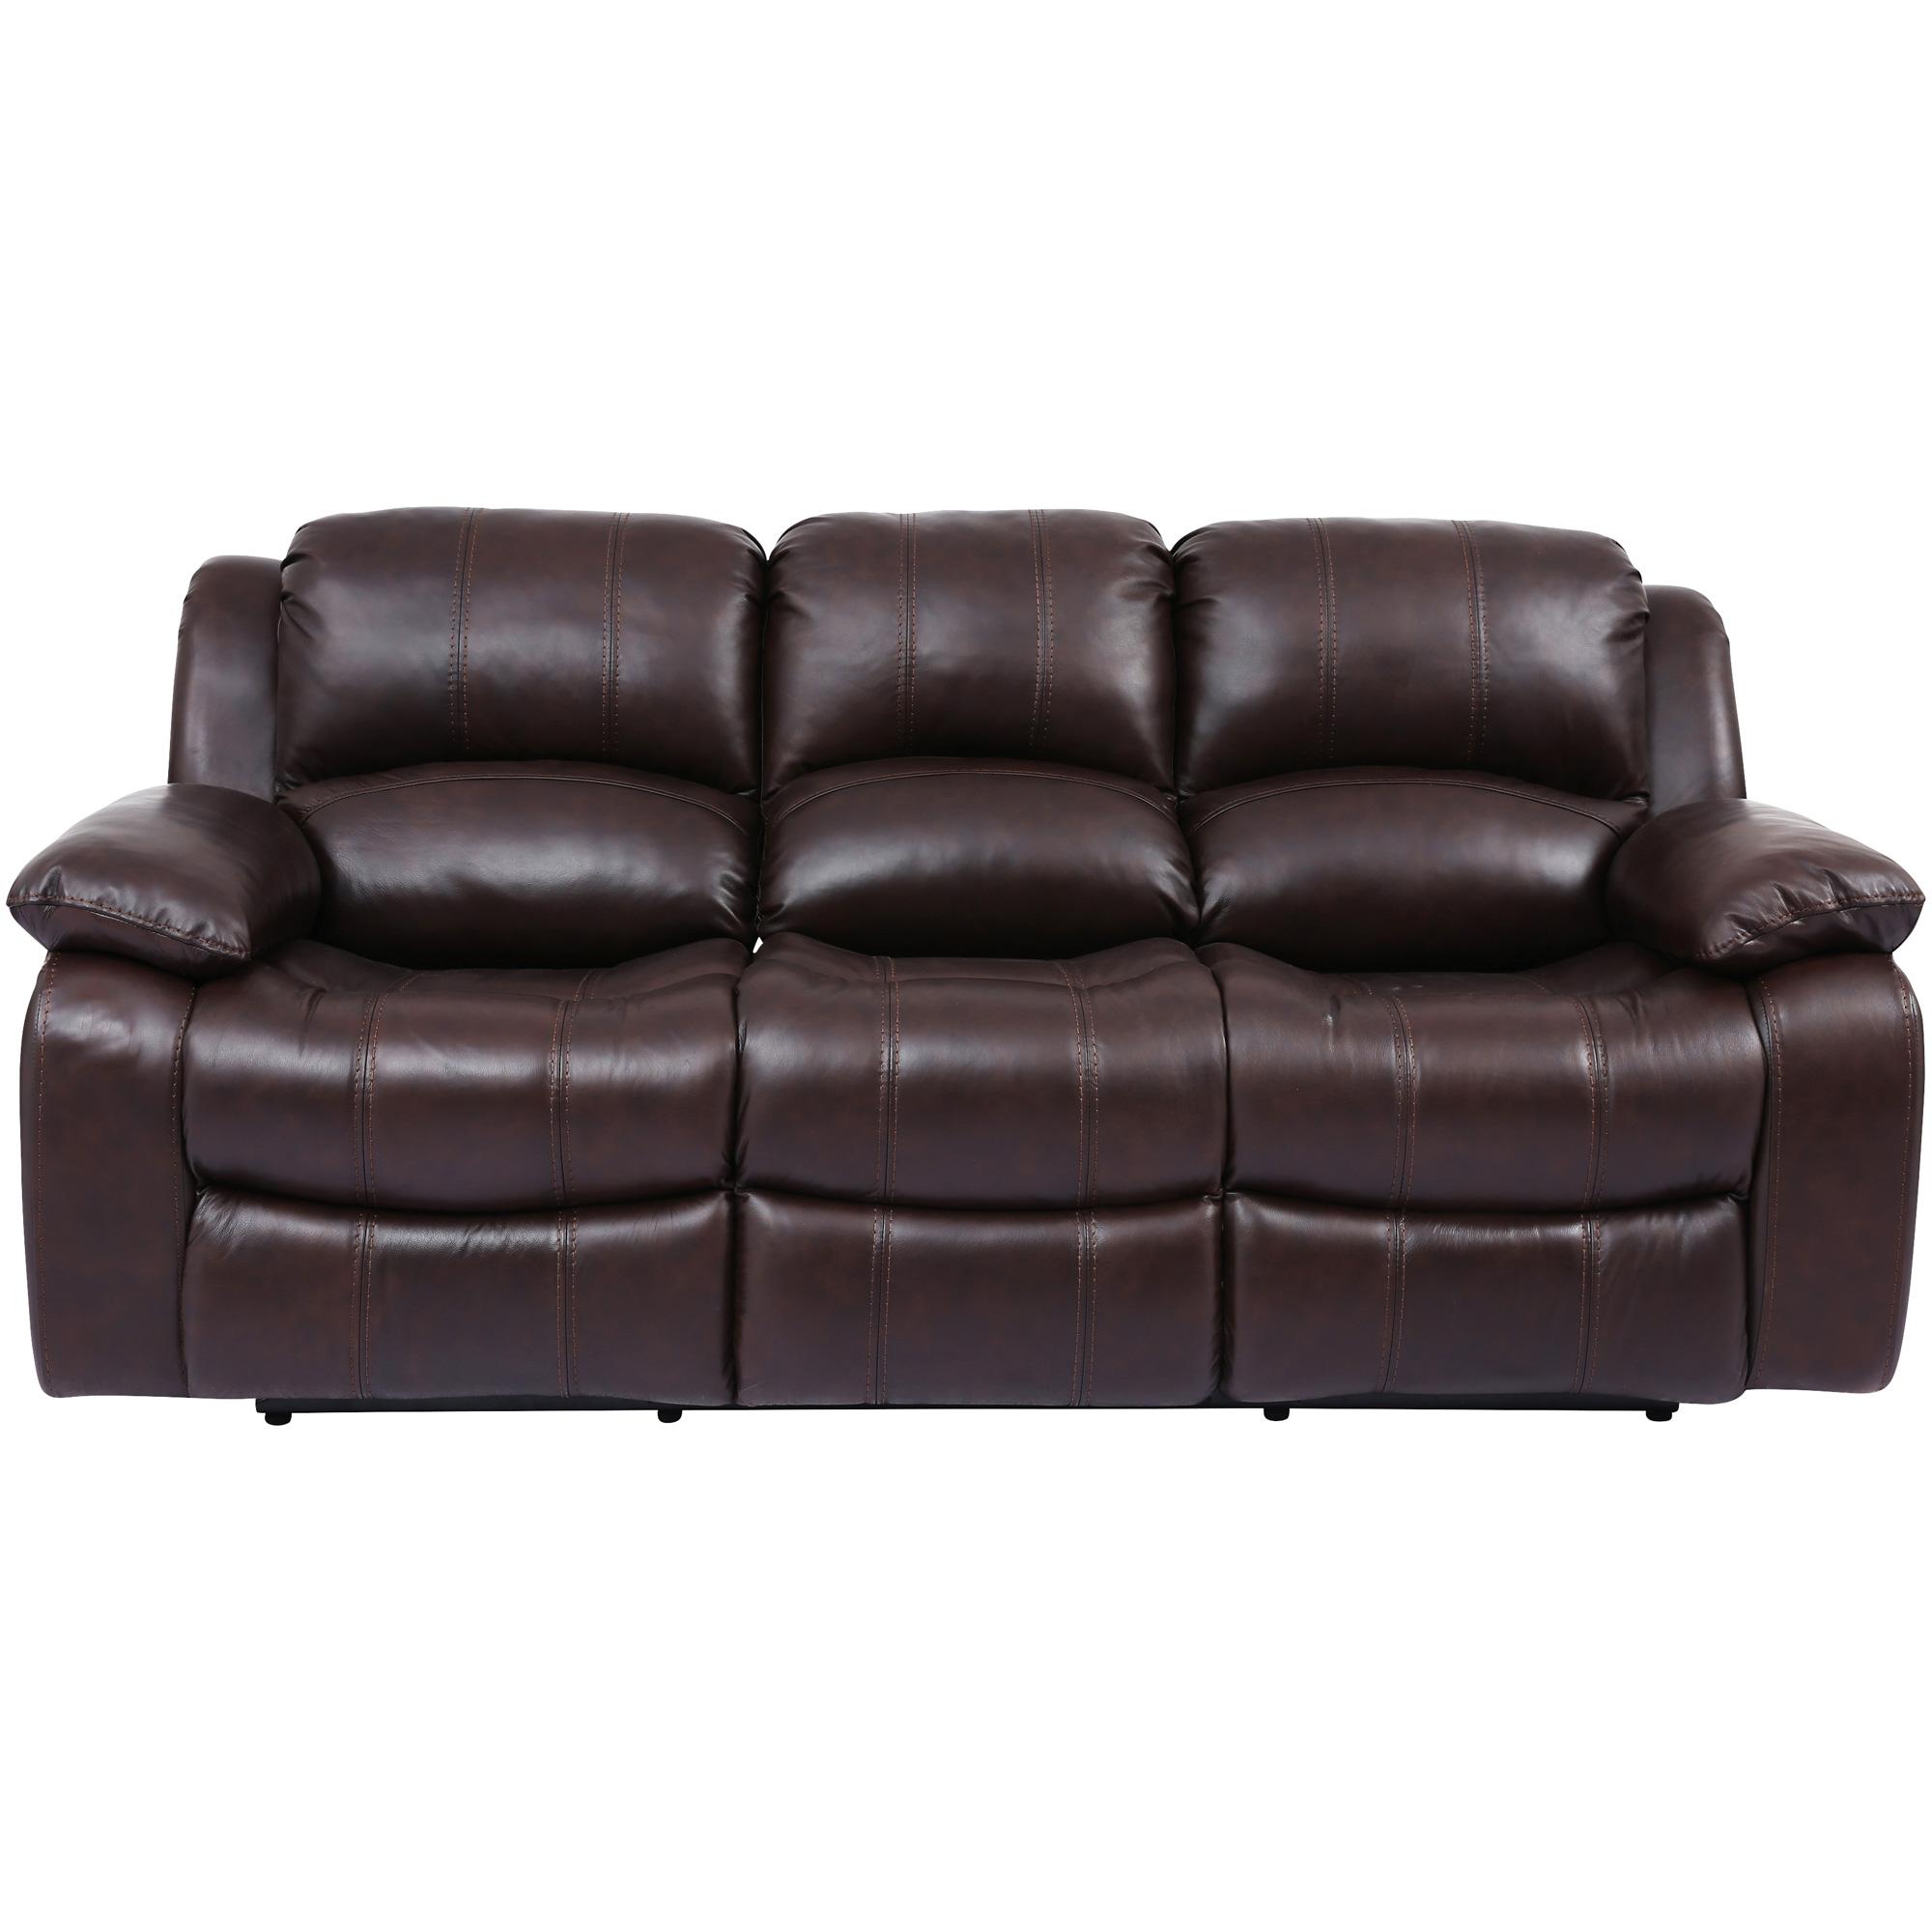 Wah Cheers | Ender Brown Leather Power+ Reclining Sofa